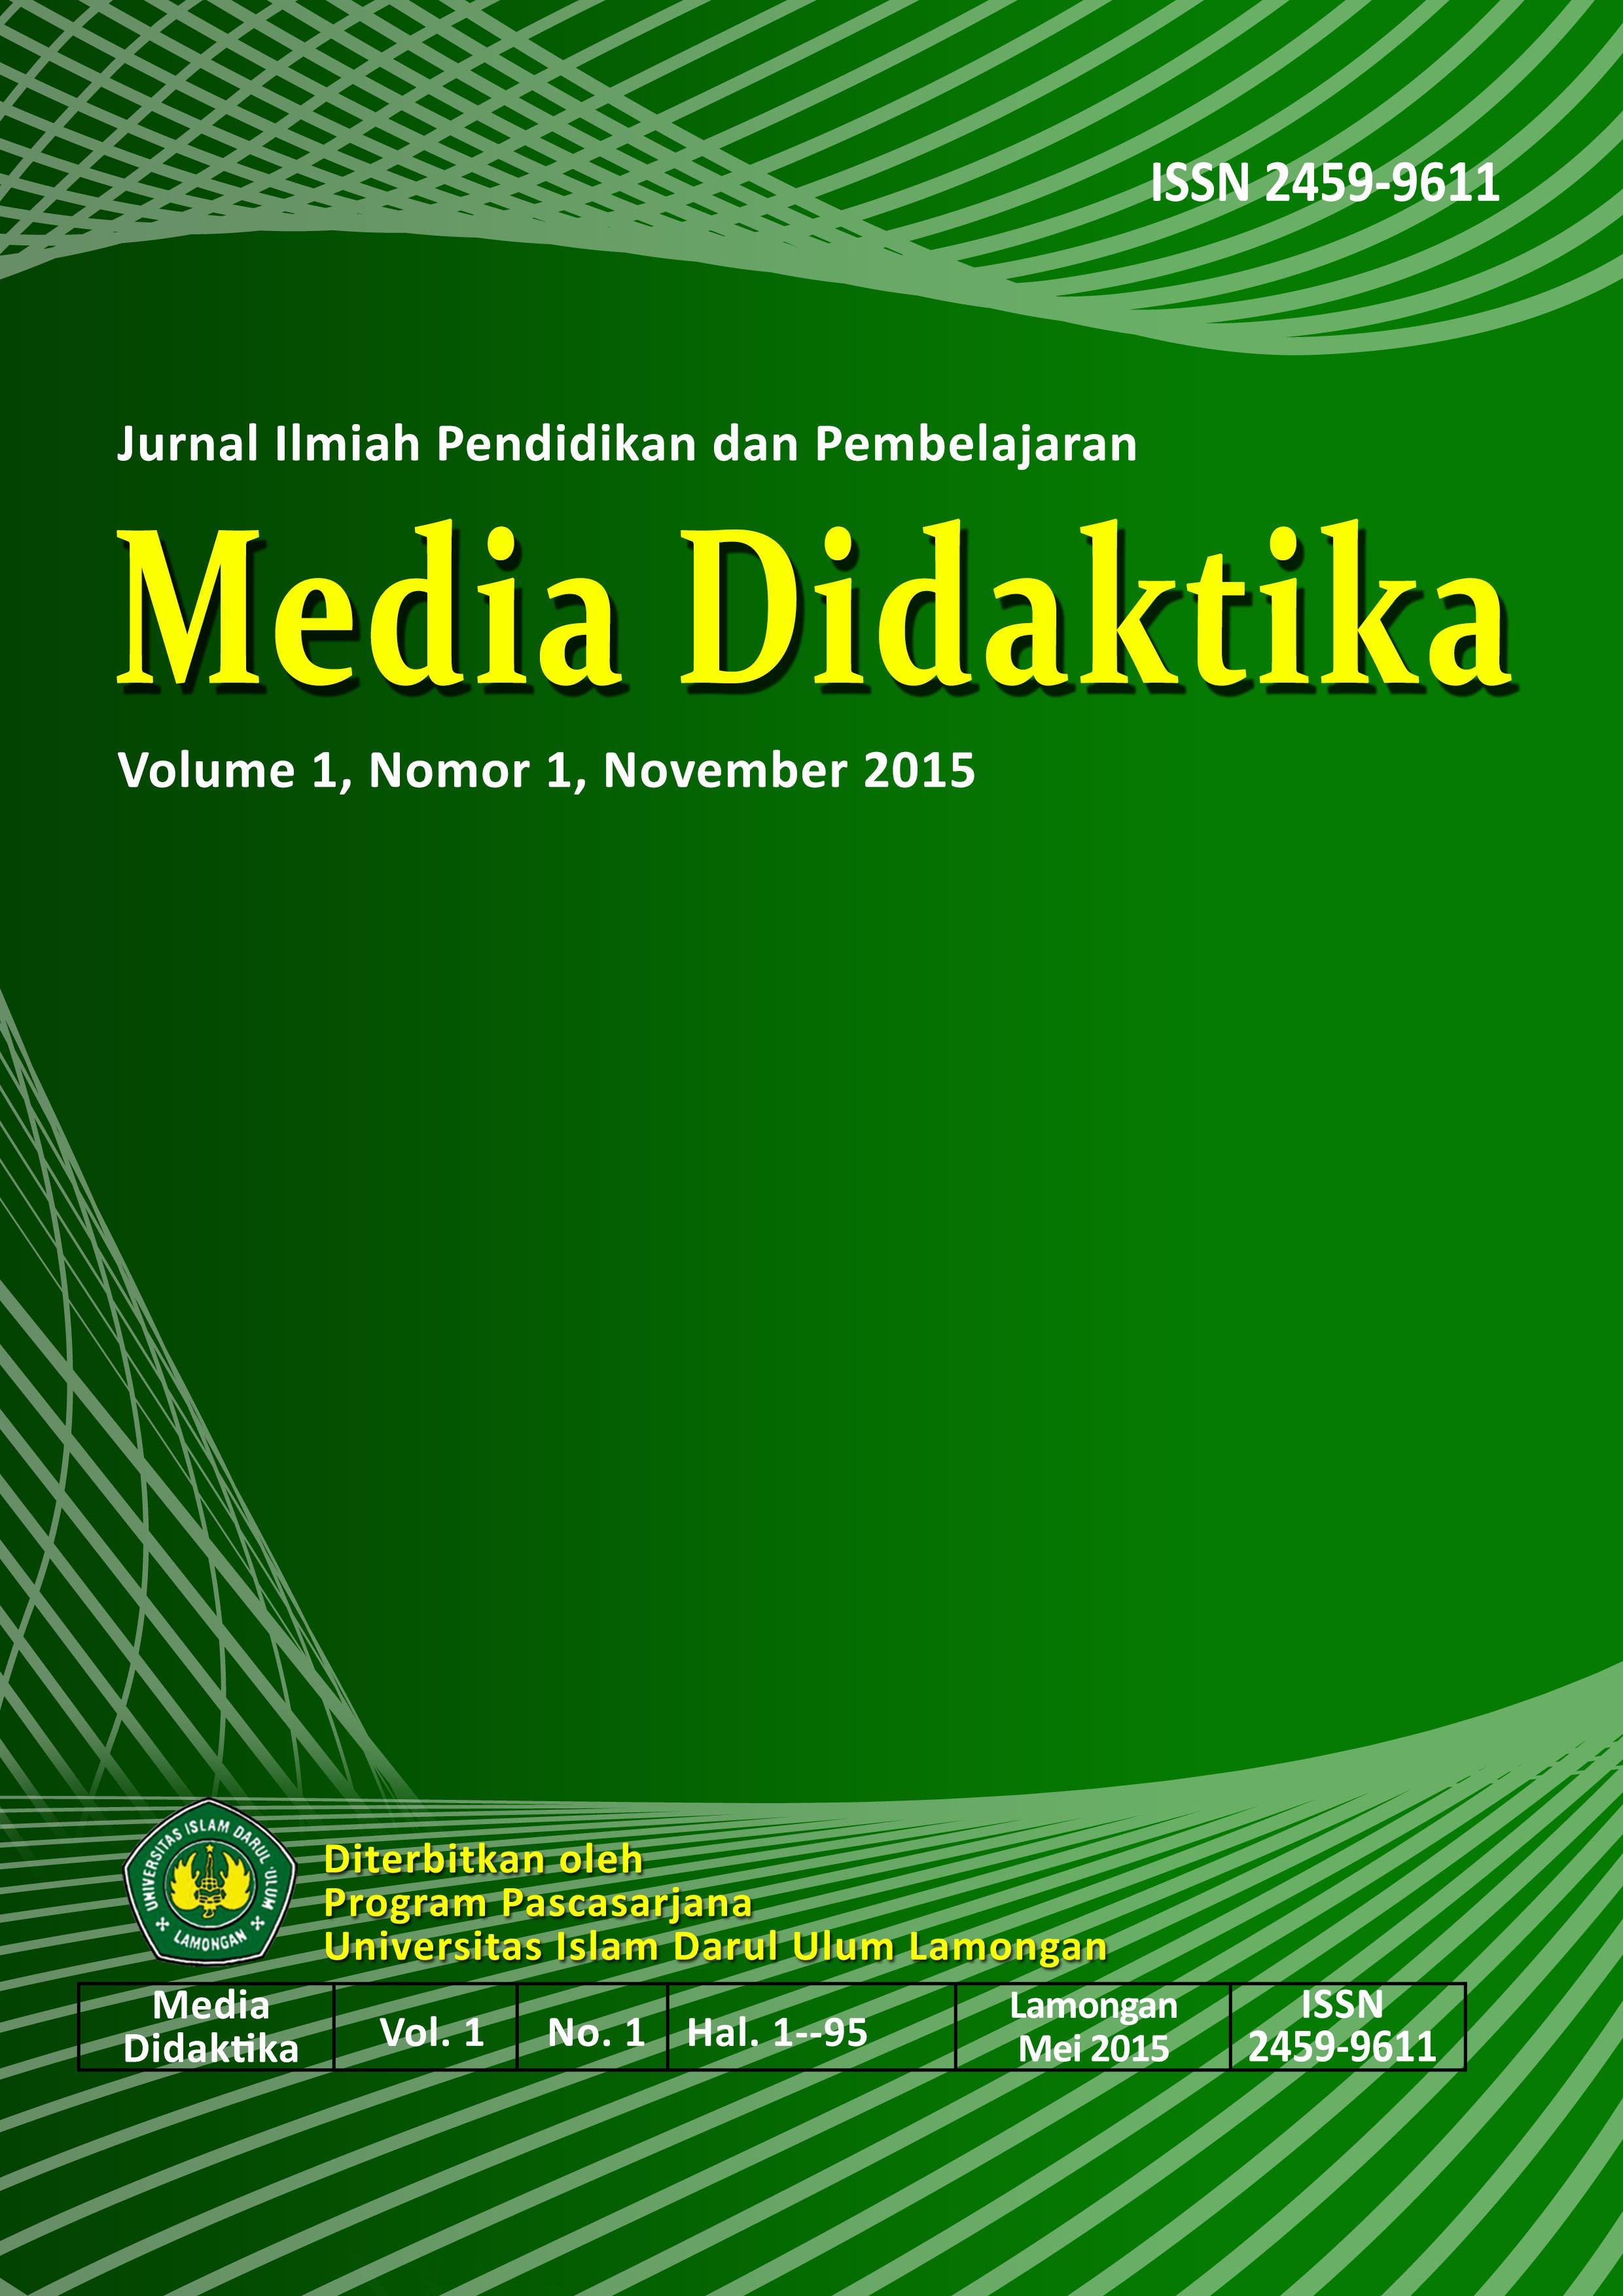 MEDIA DIDAKTIKA : Jurnal Ilmiah Pendidikan dan Pembelajaran